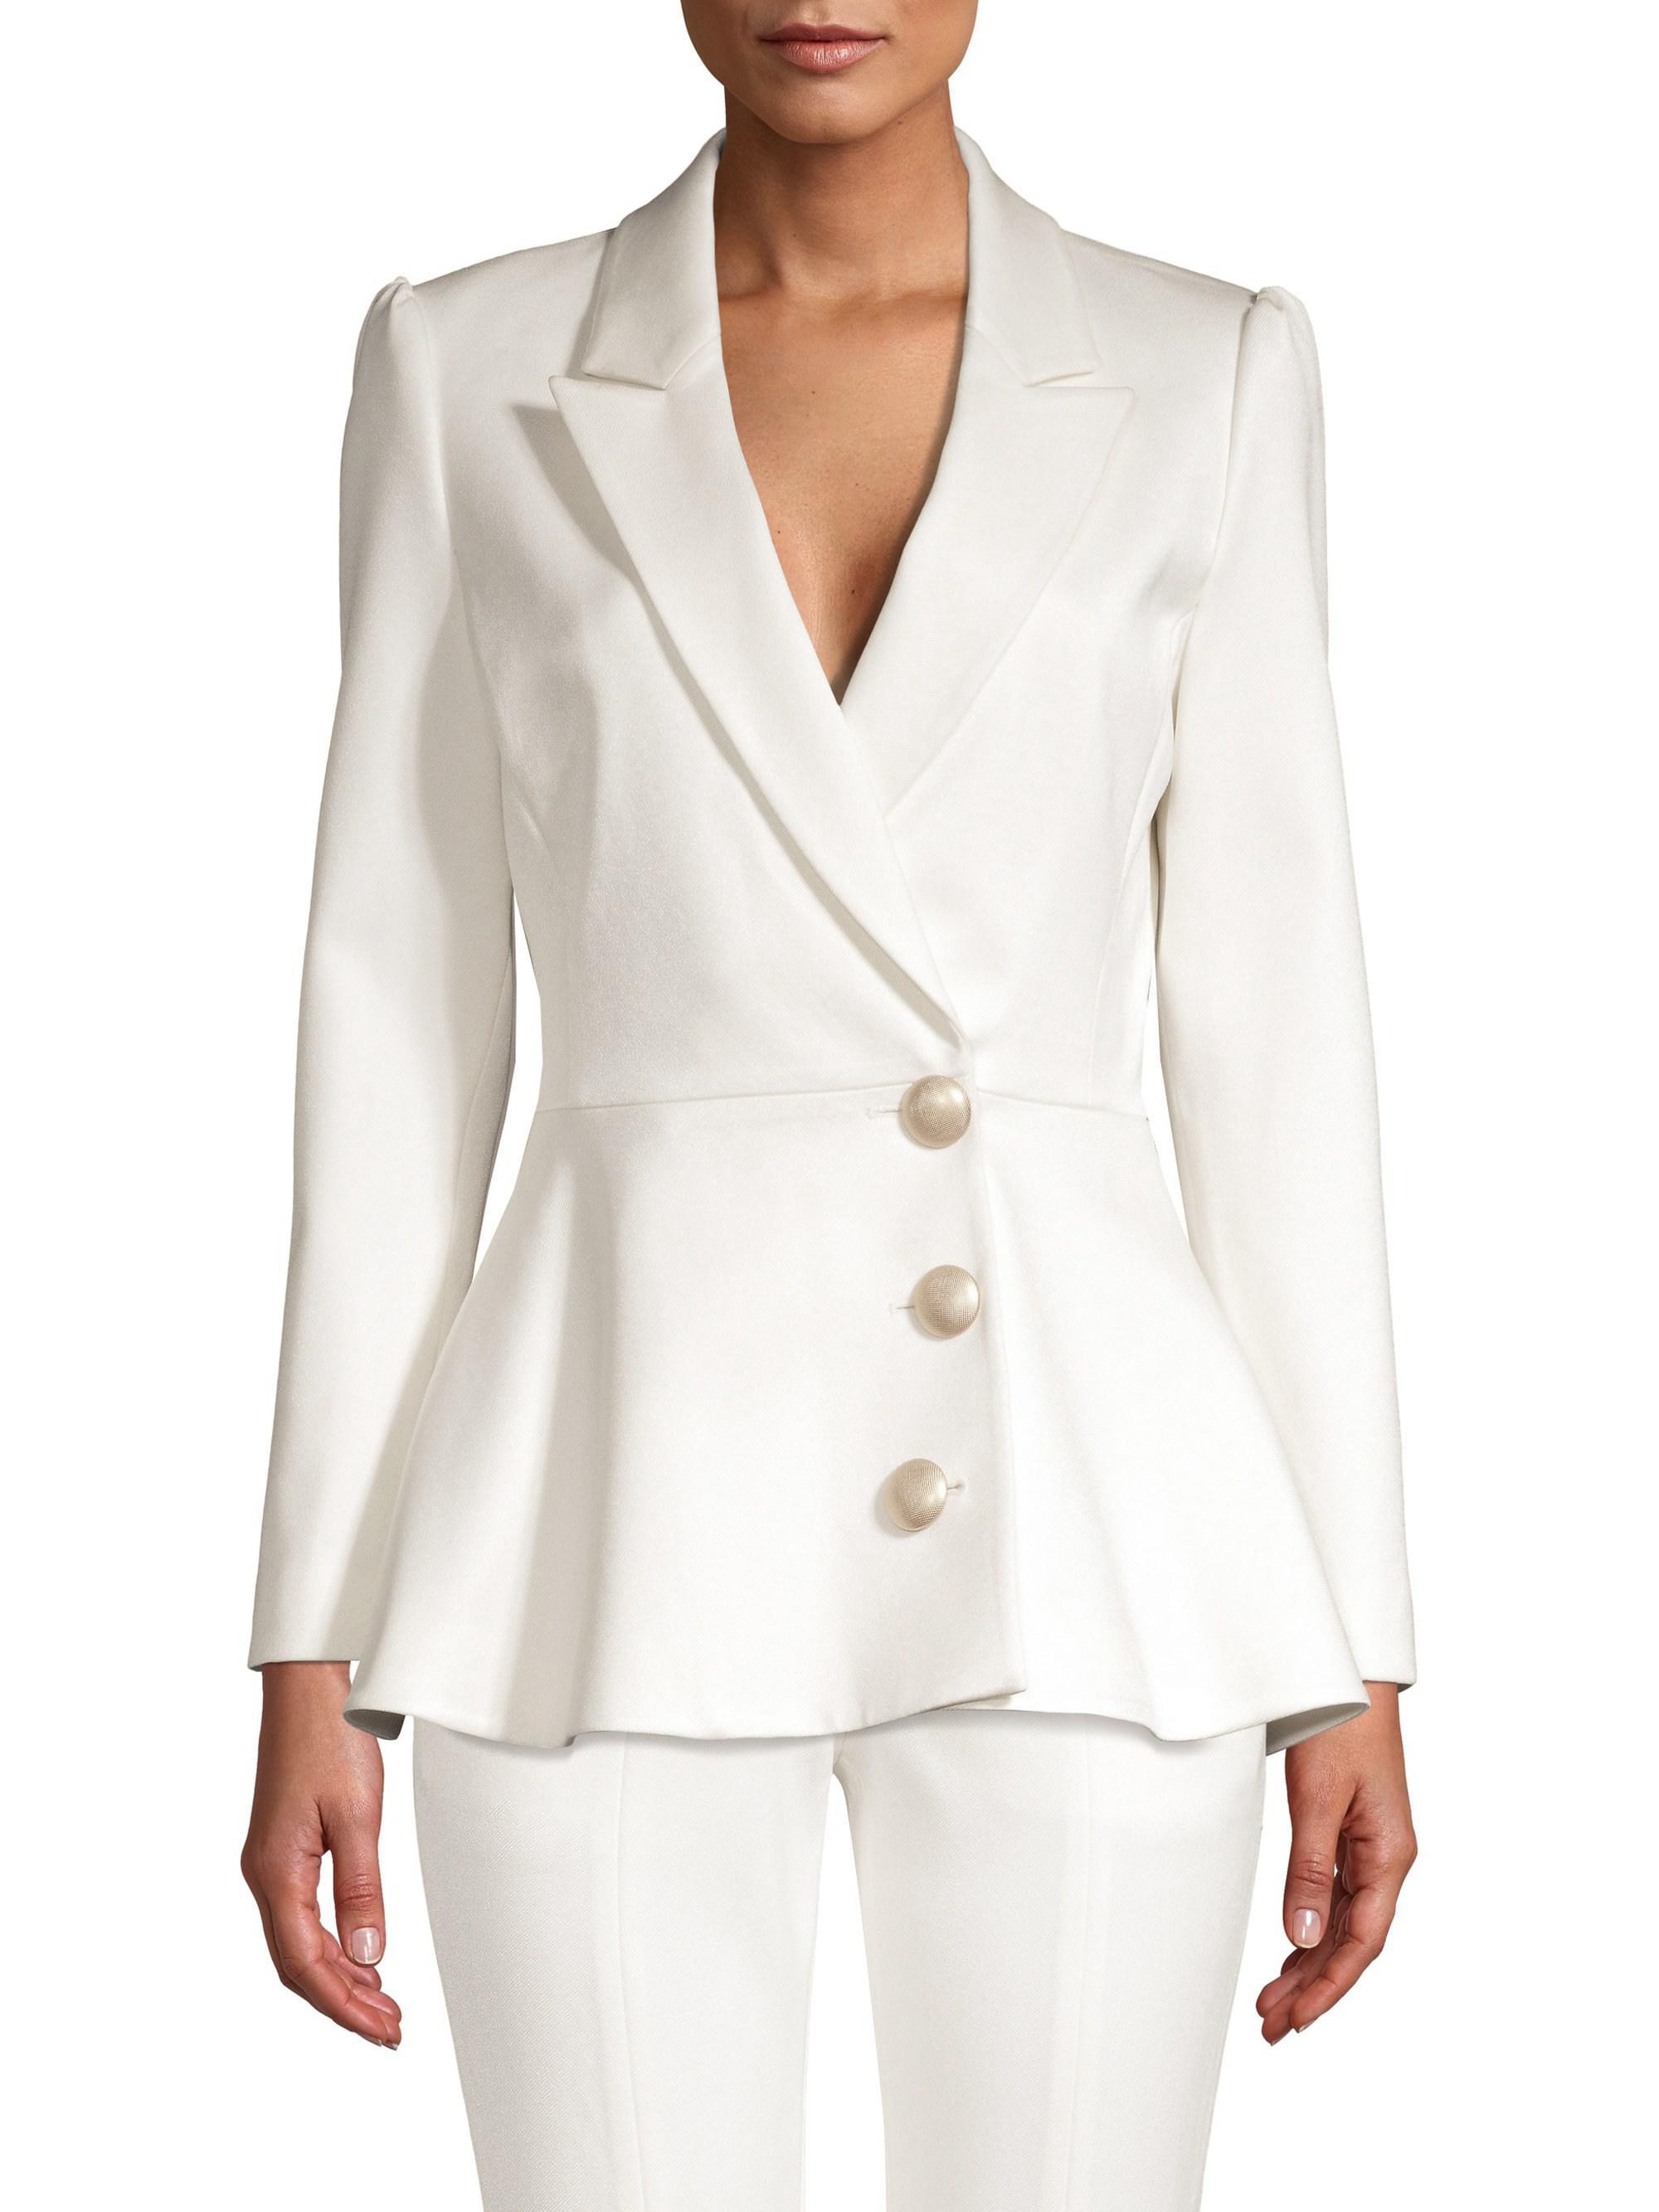 2157f354eadd Misha Collection Novalee Peplum Blazer in White - Lyst